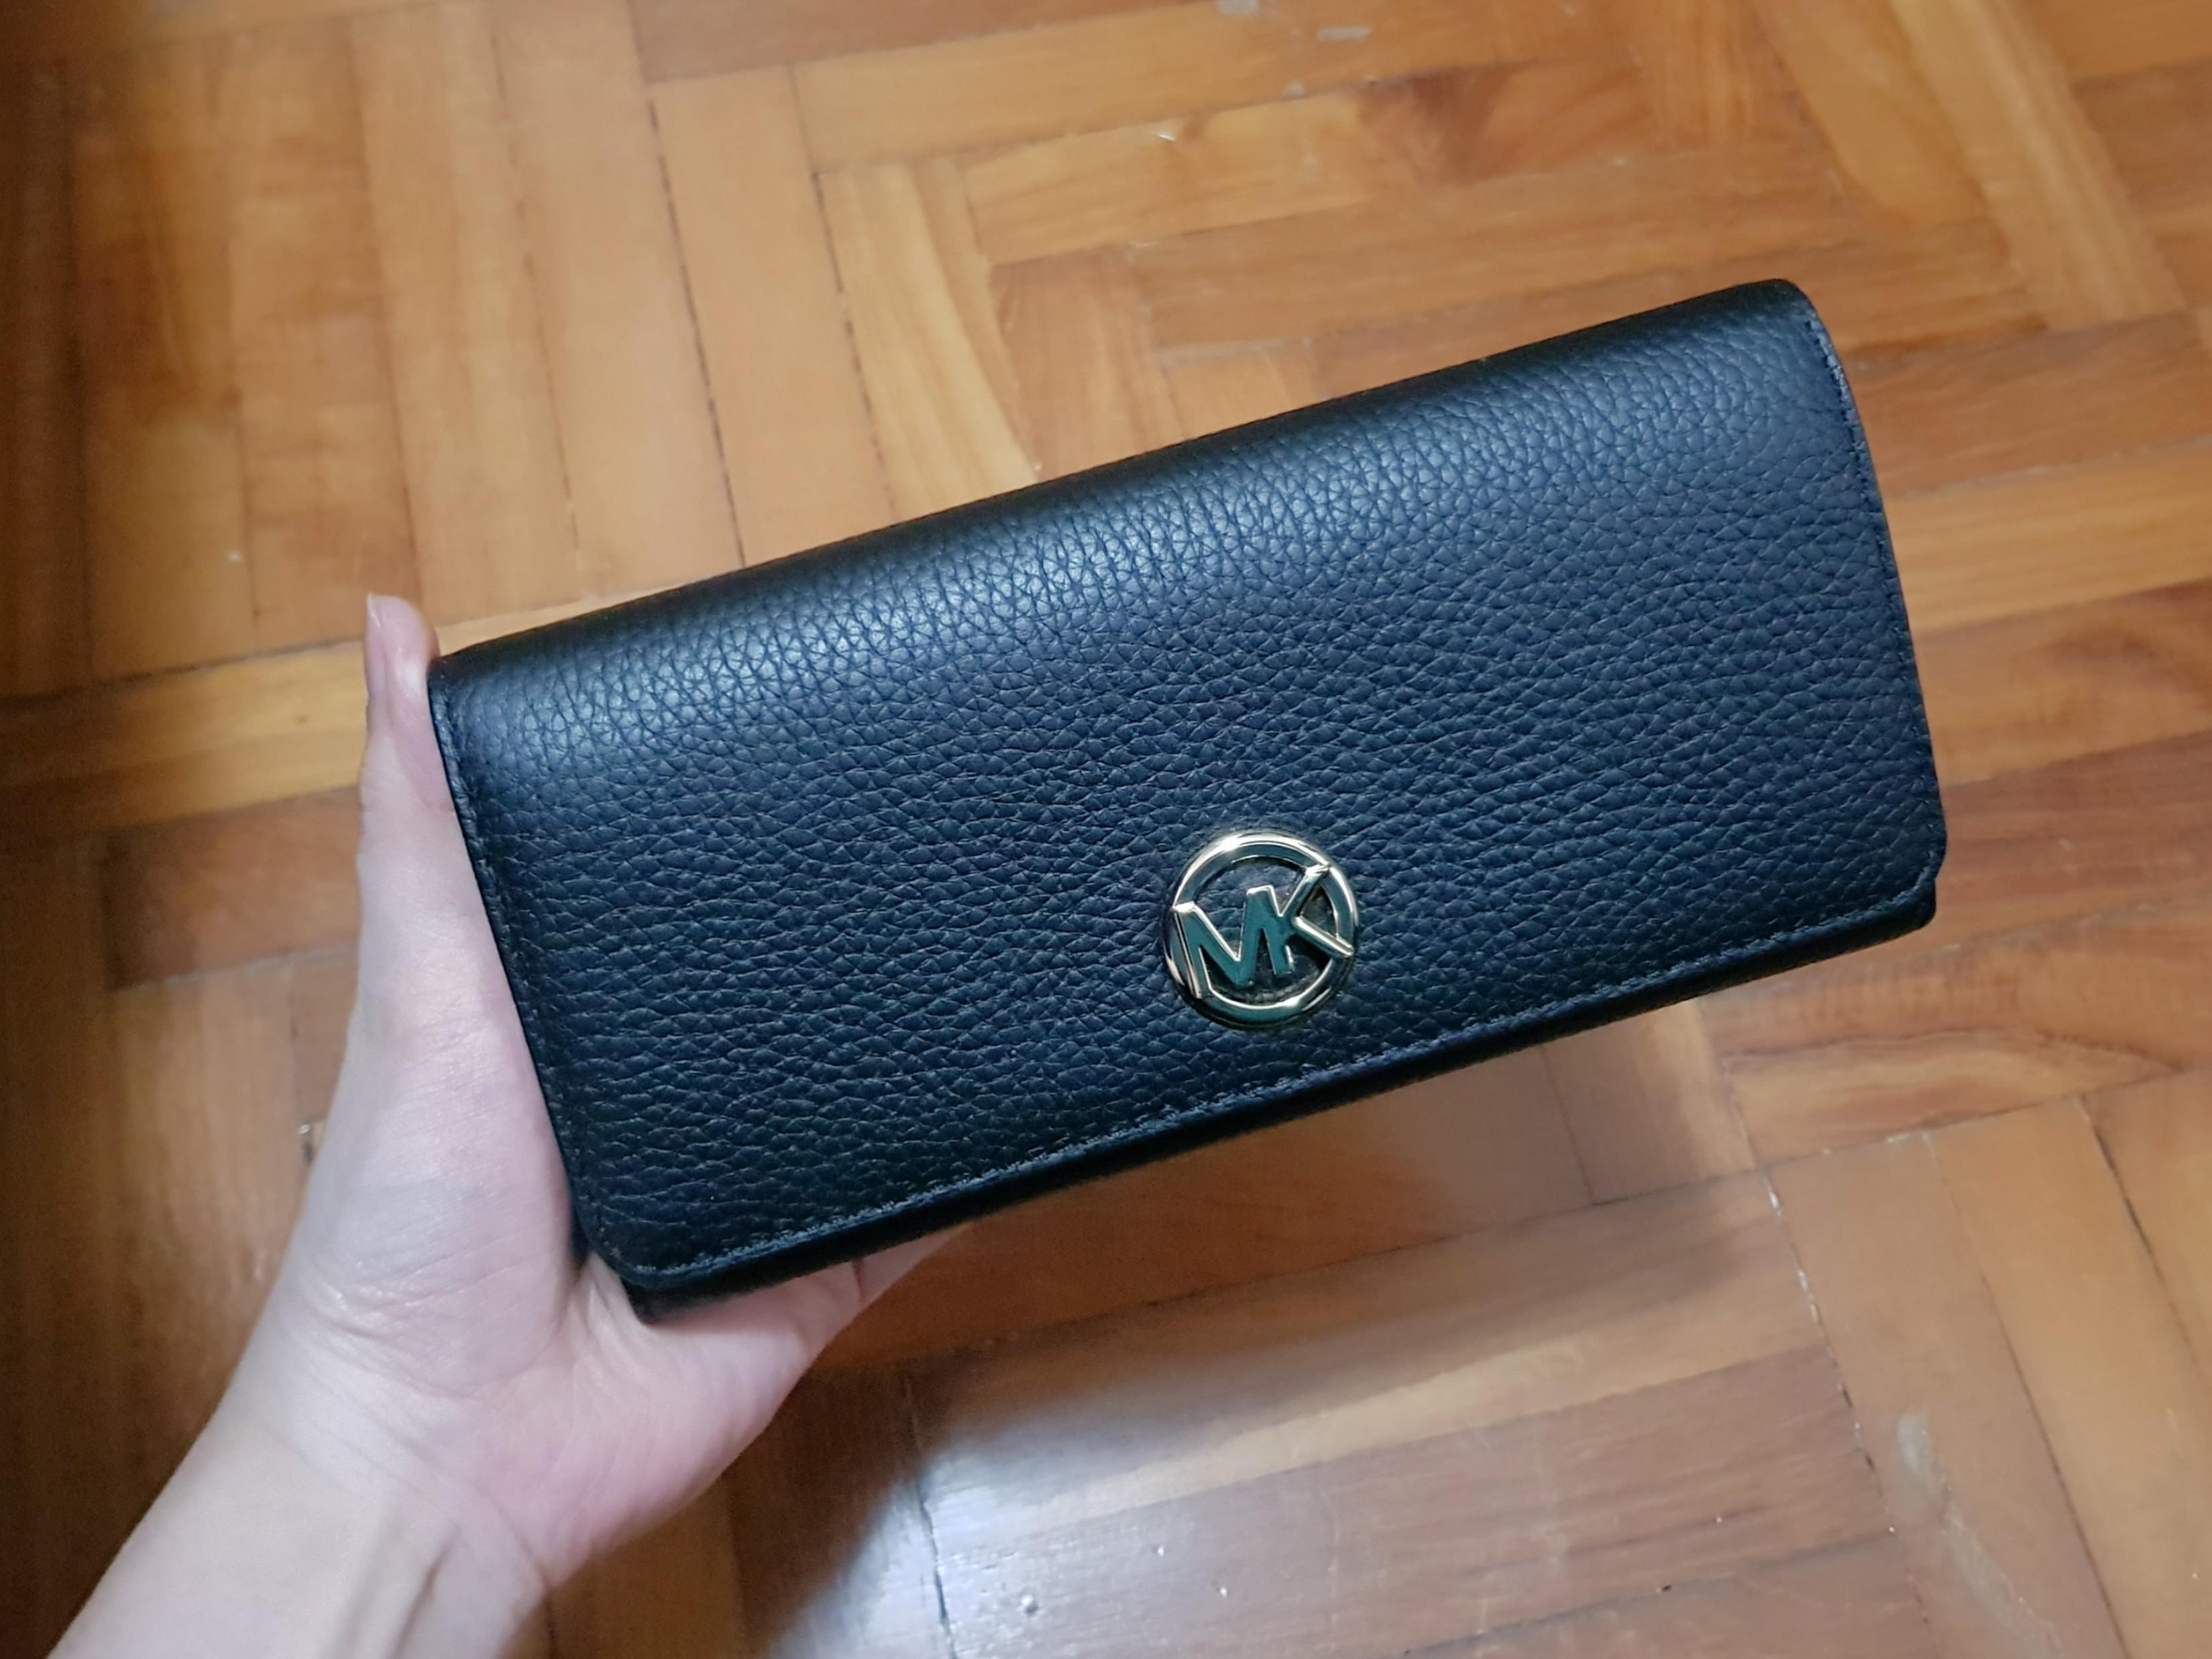 562c402937c4 163 ONLY. Michael Kors Fulton Flap Continental Long Wallet, Women's ...